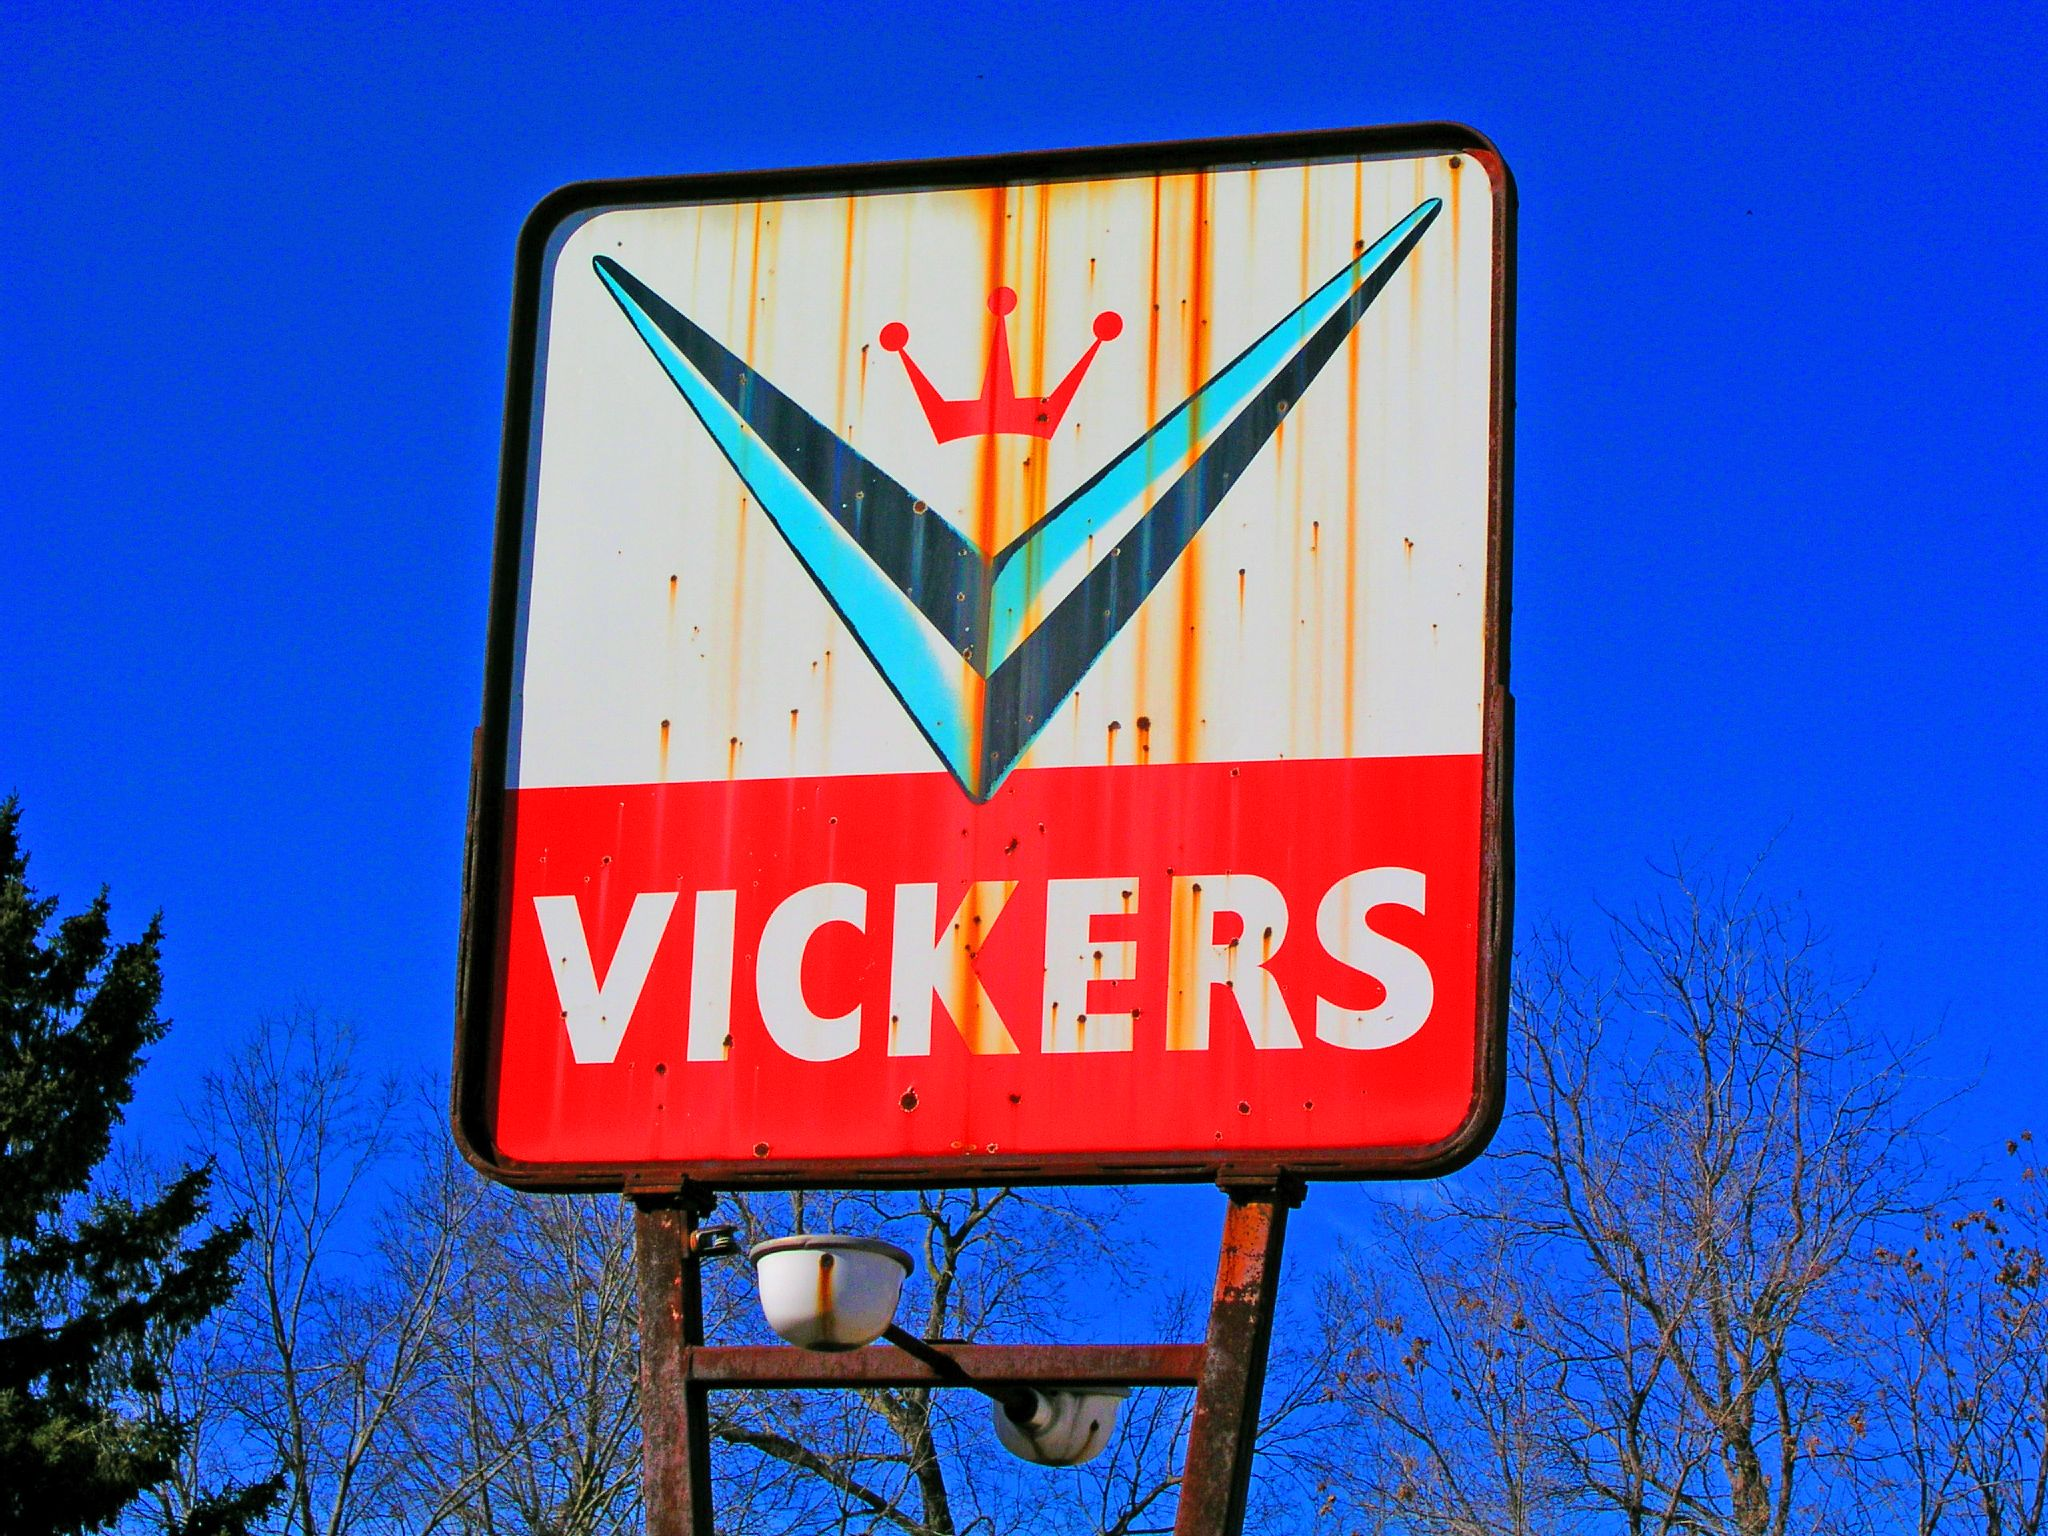 Vickers Petroleum - Kansas City, Missouri U.S.A. - February 22, 2007